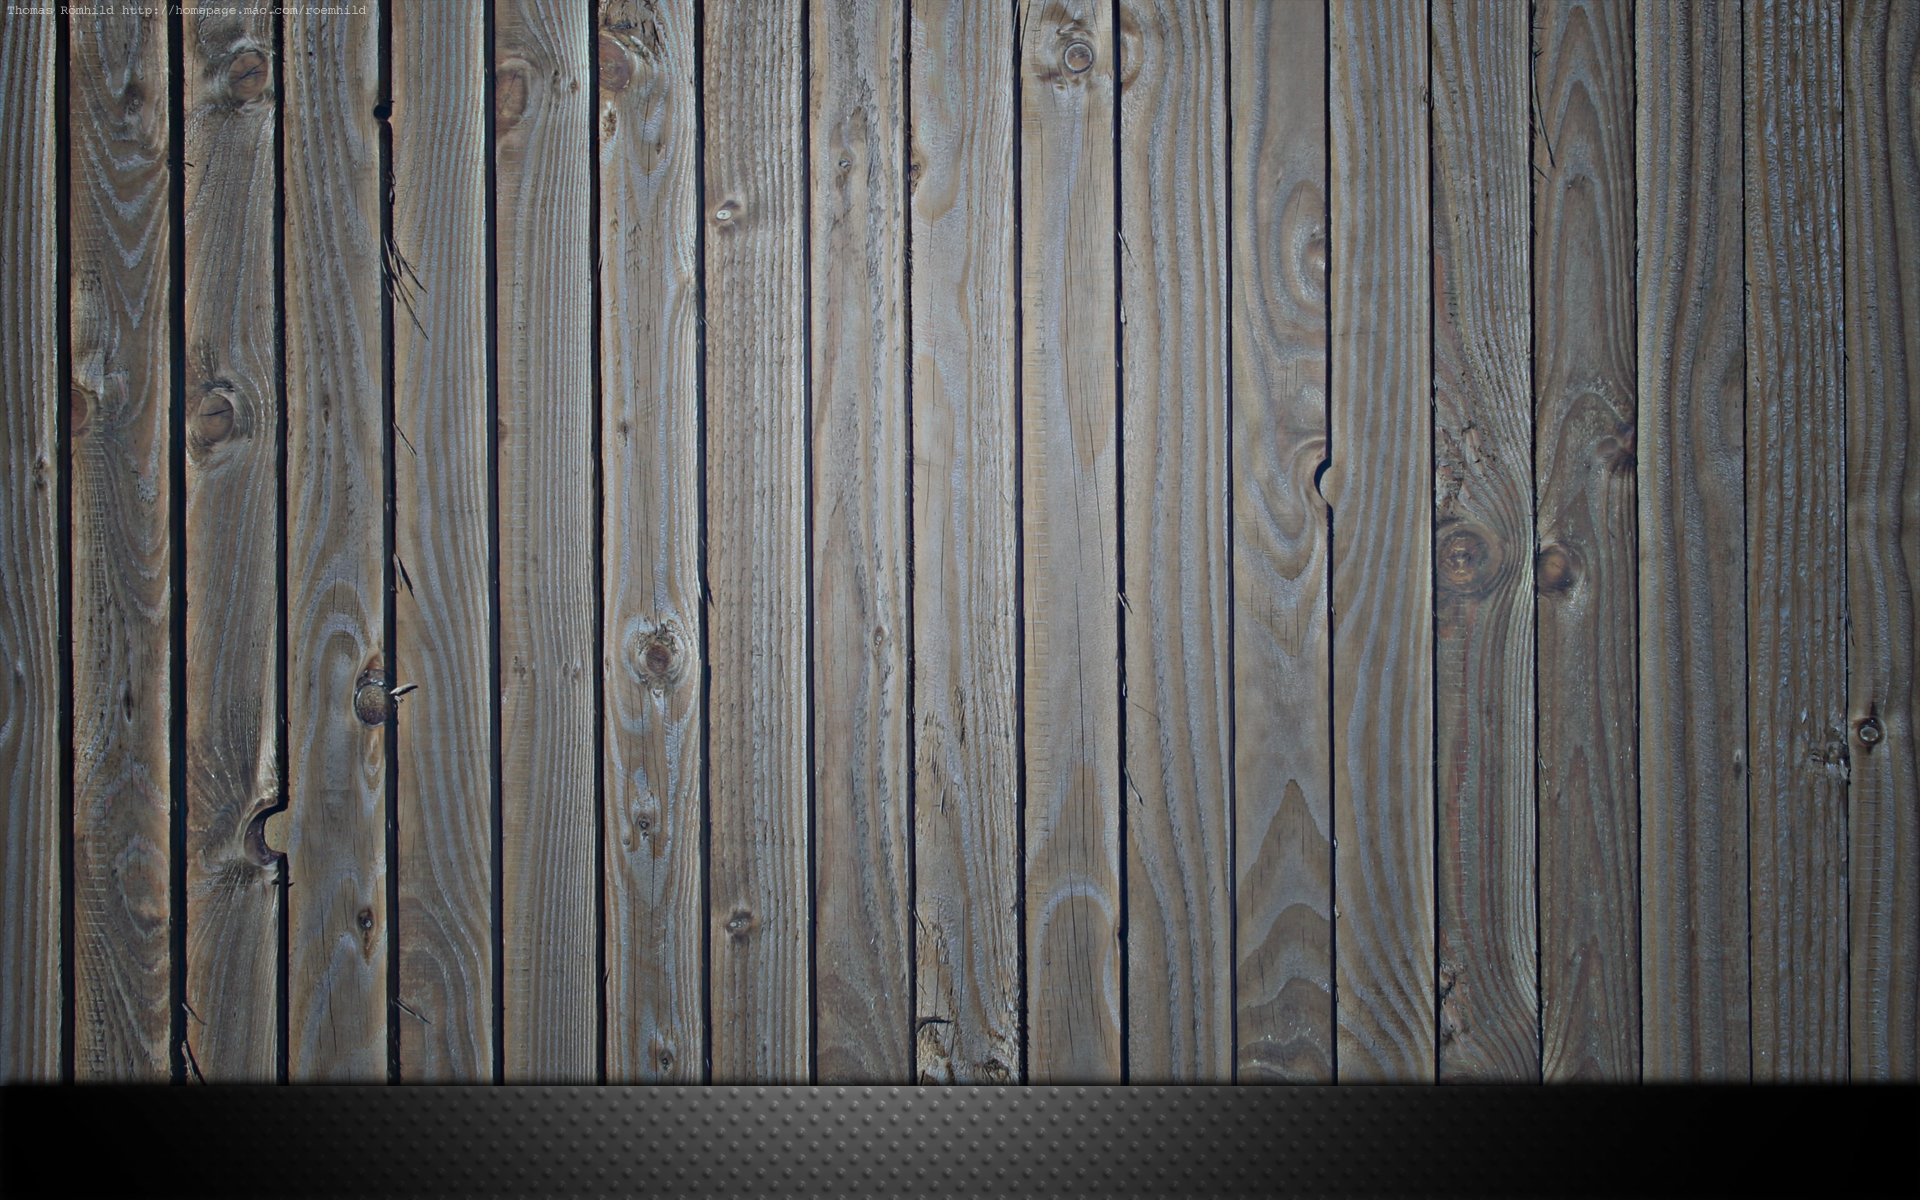 wallpaper abstract wood designs dock1 grey 1920x1200